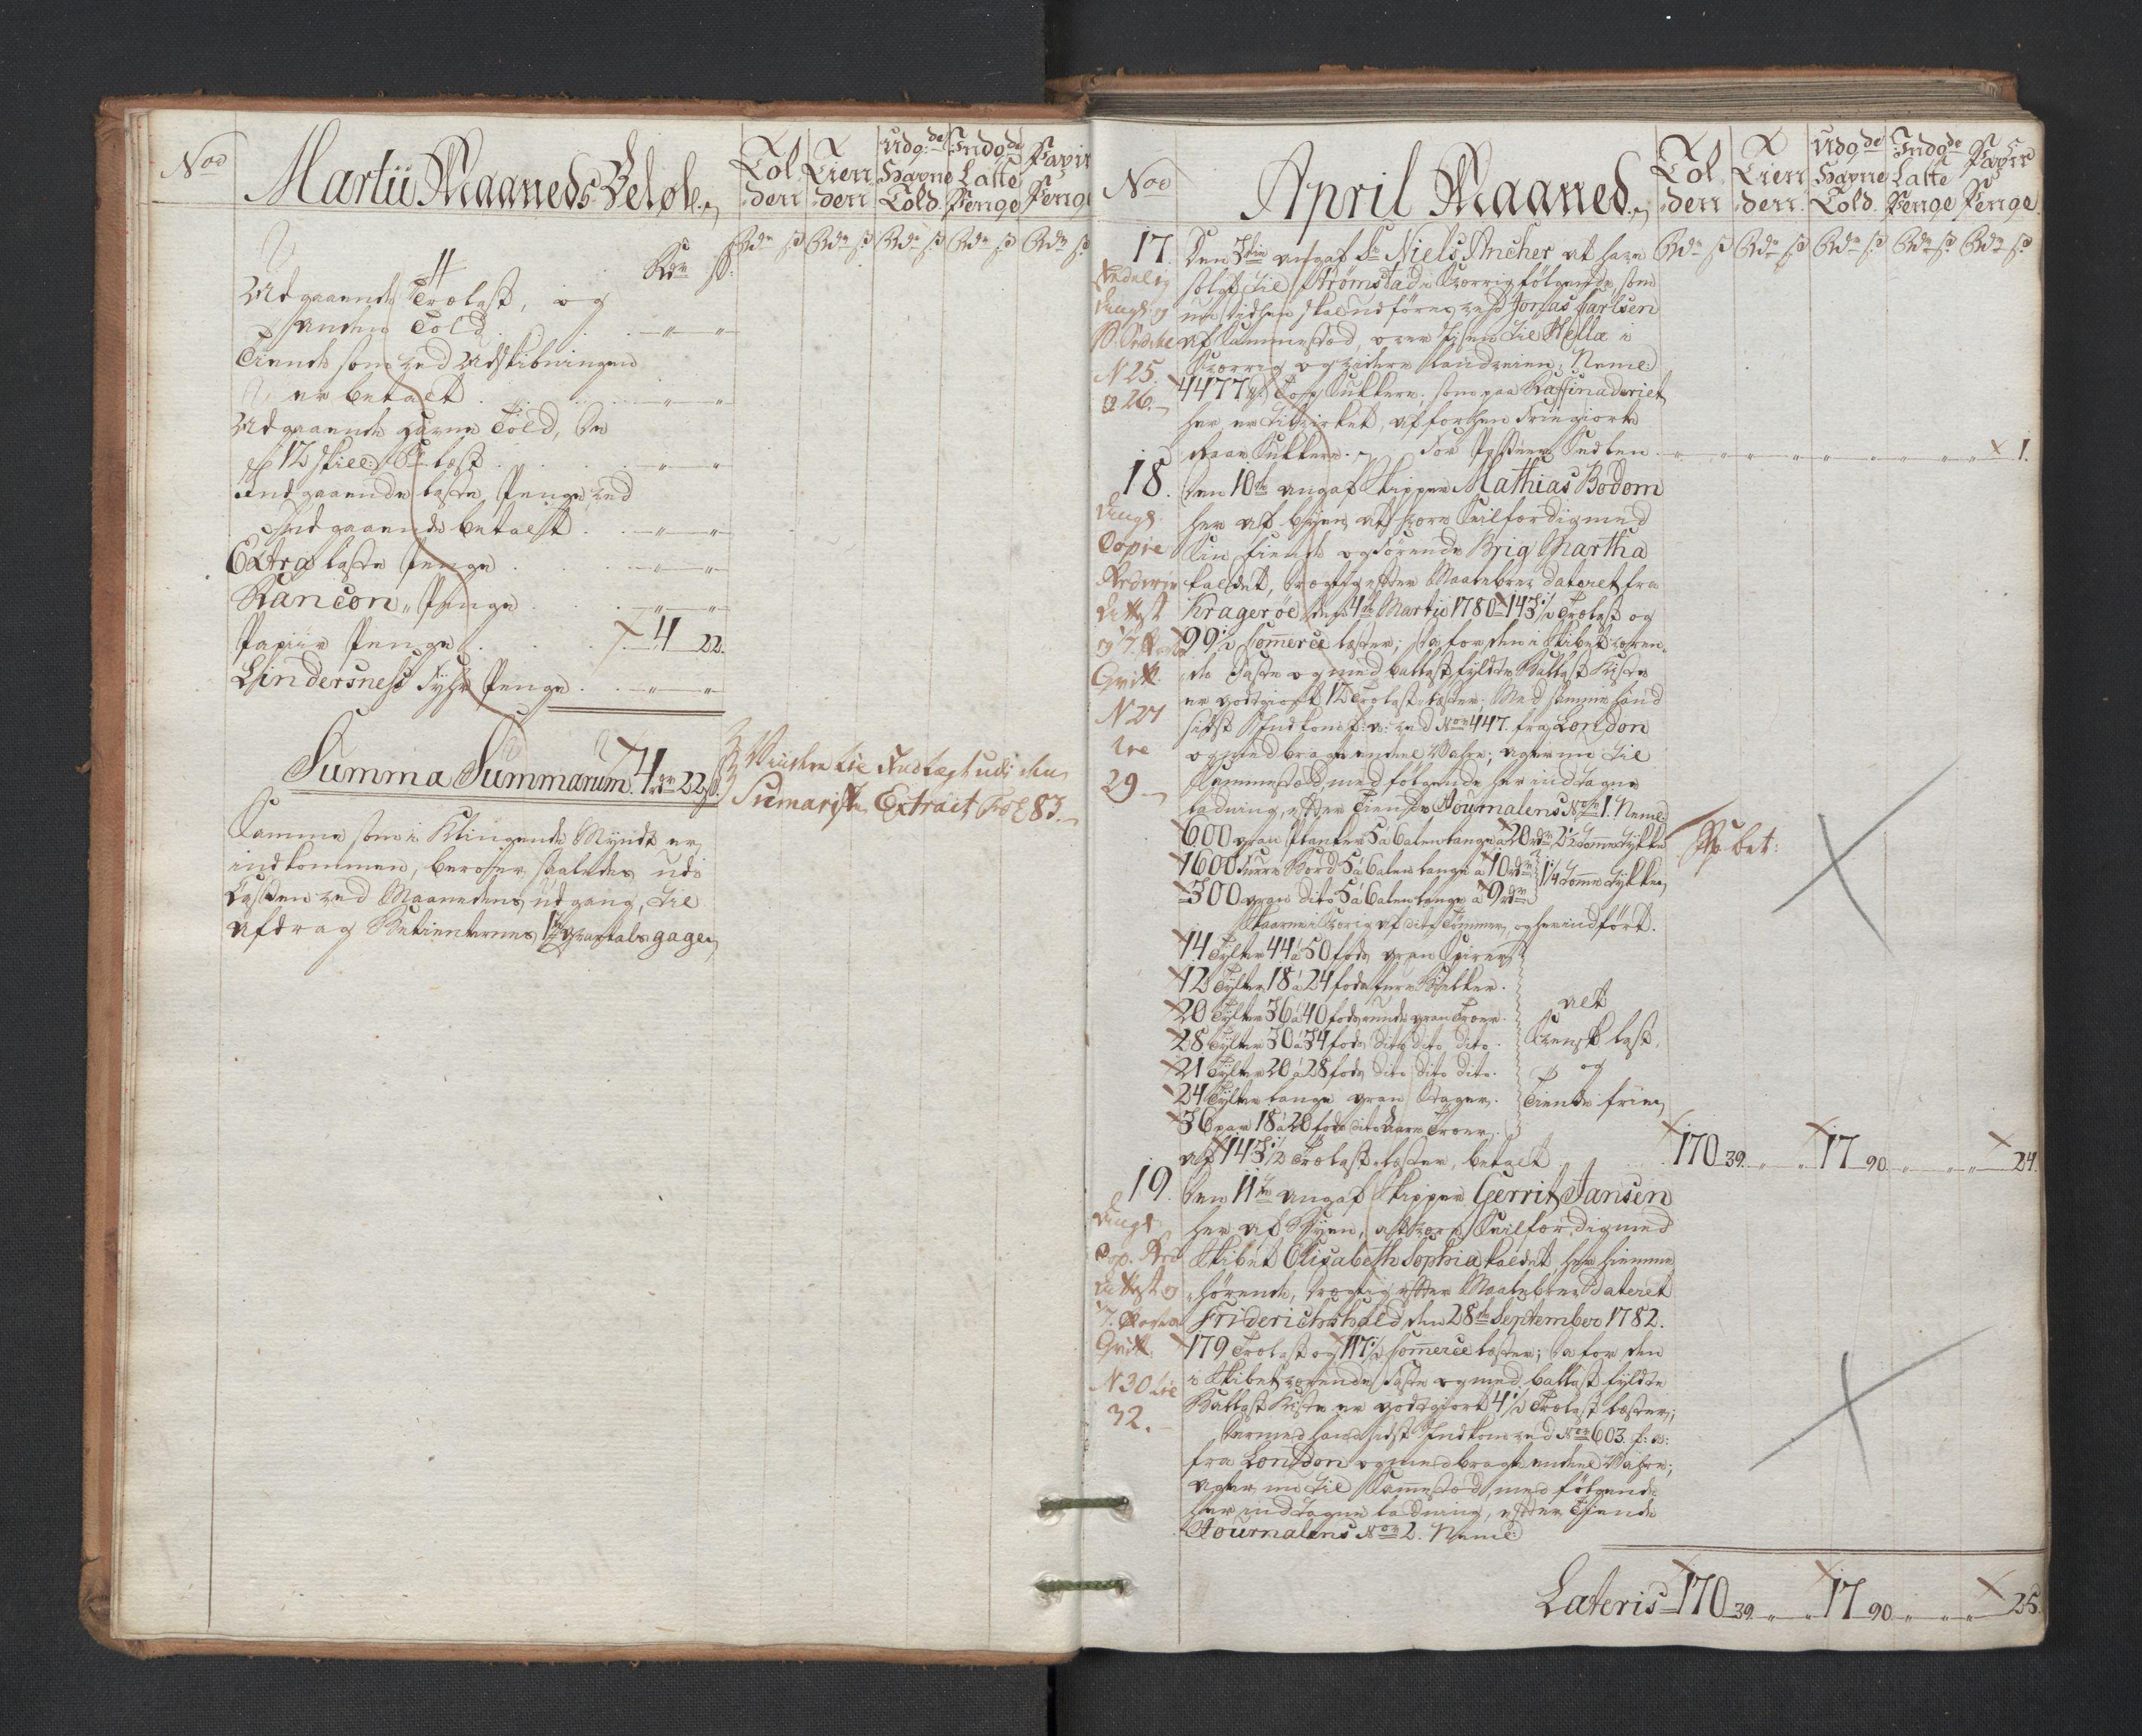 RA, Generaltollkammeret, tollregnskaper, R01/L0131: Tollregnskaper Fredrikshald, 1786, s. 4b-5a